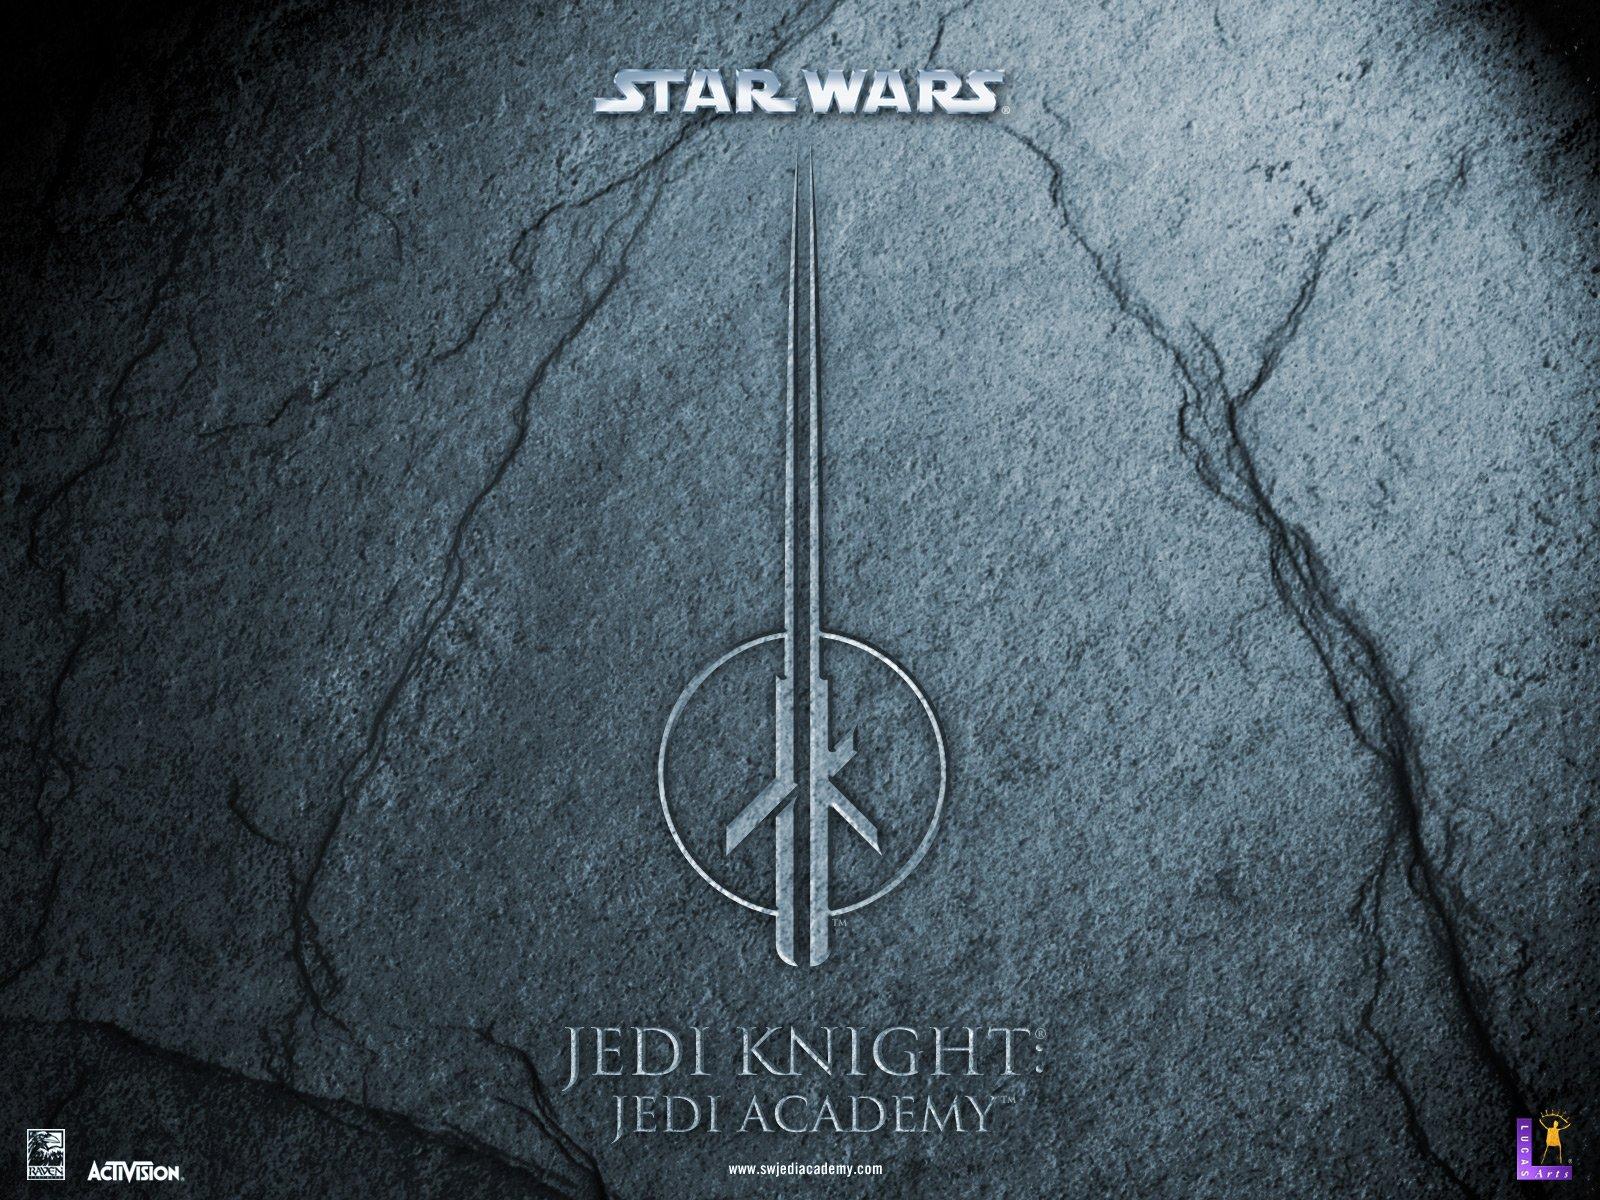 Мультиплеер Star Wars Jedi Knight: Jedi Academy - день 1 - Изображение 1